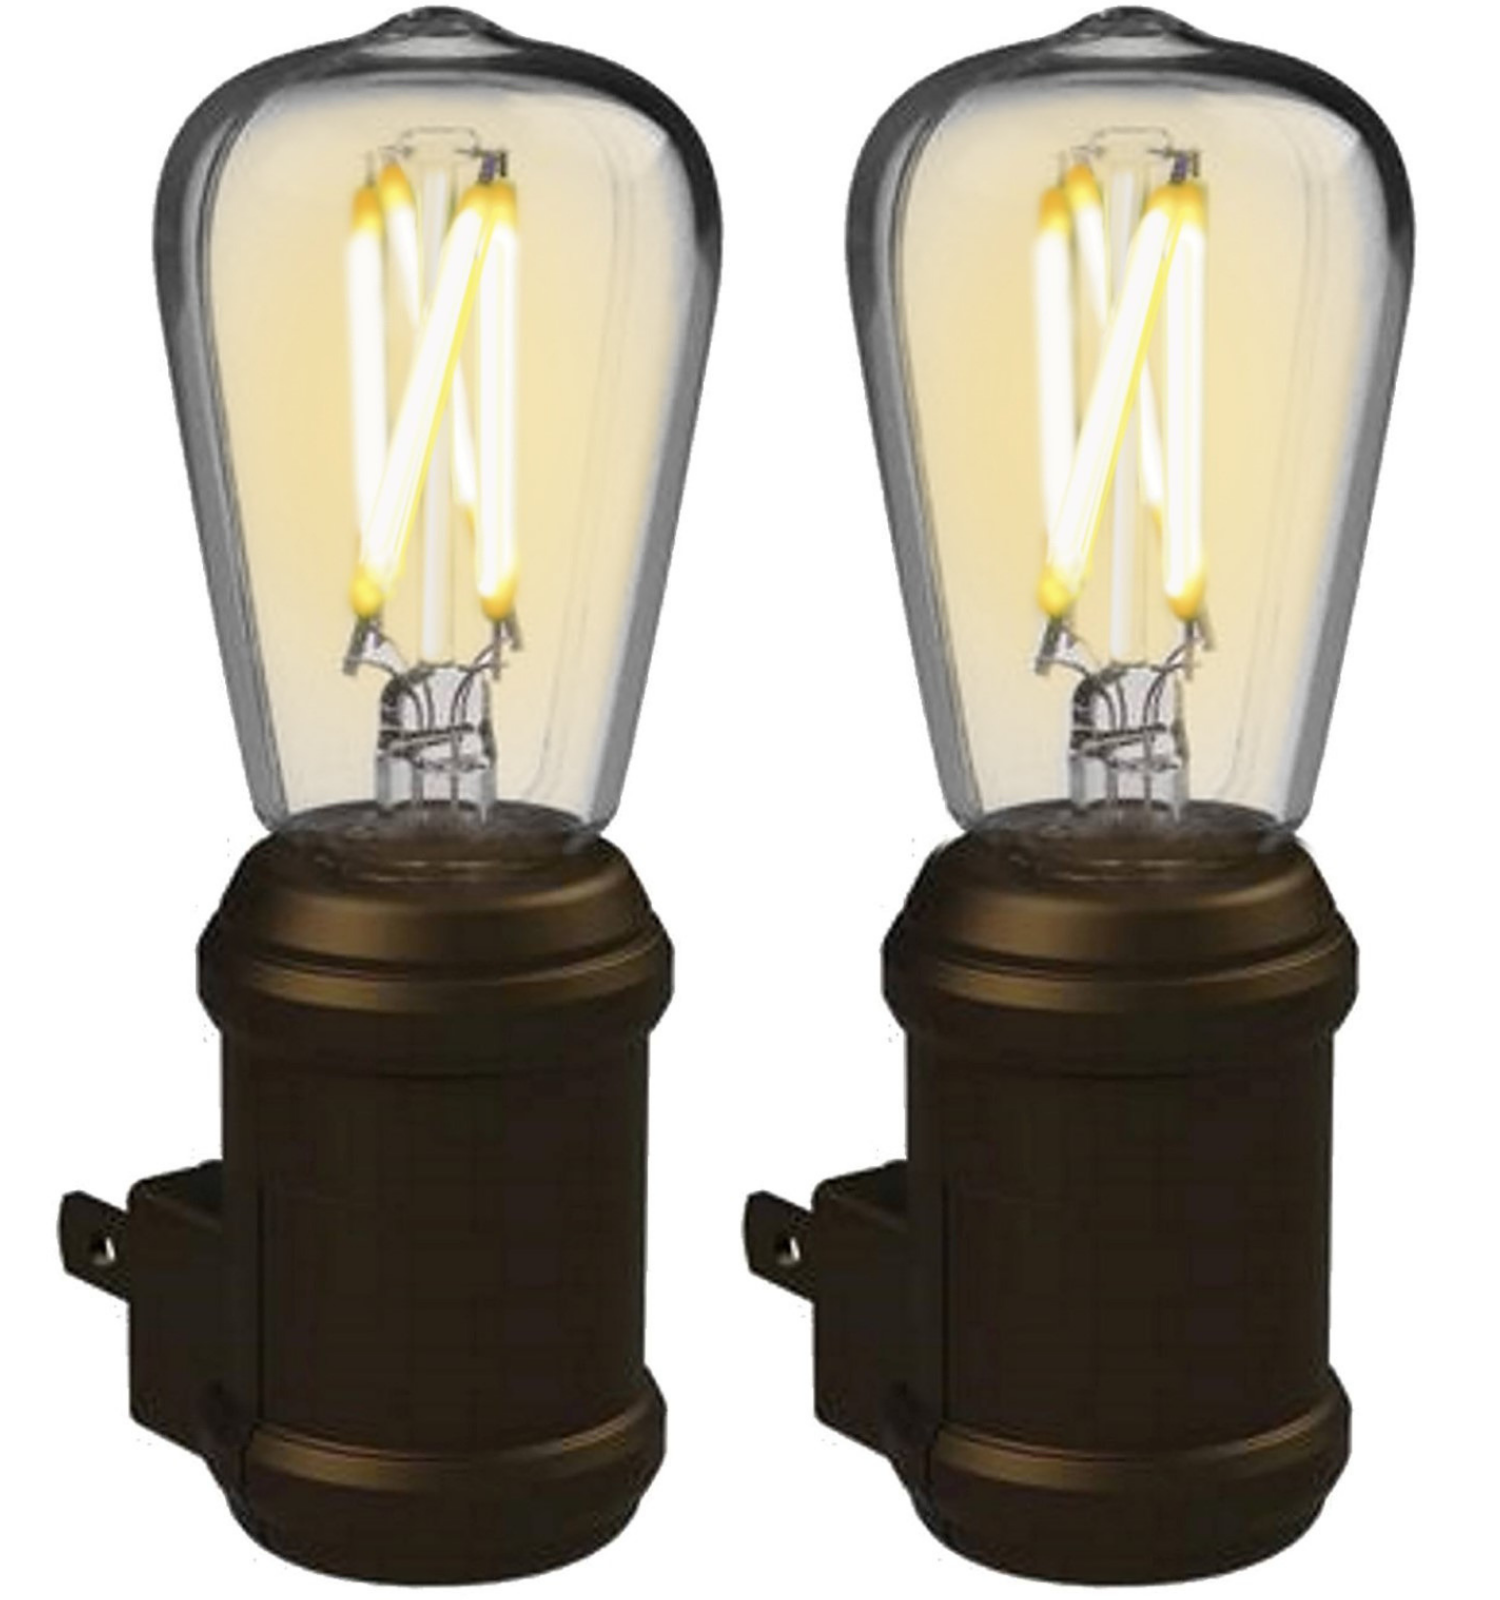 Westek LED Edison Filament Plug-In Vintage Night Light - Energy Efficient - Auto Dusk-Dawn Sensor - Warm Amber Glow, Ideal for Bedrooms, Bathrooms, Ha